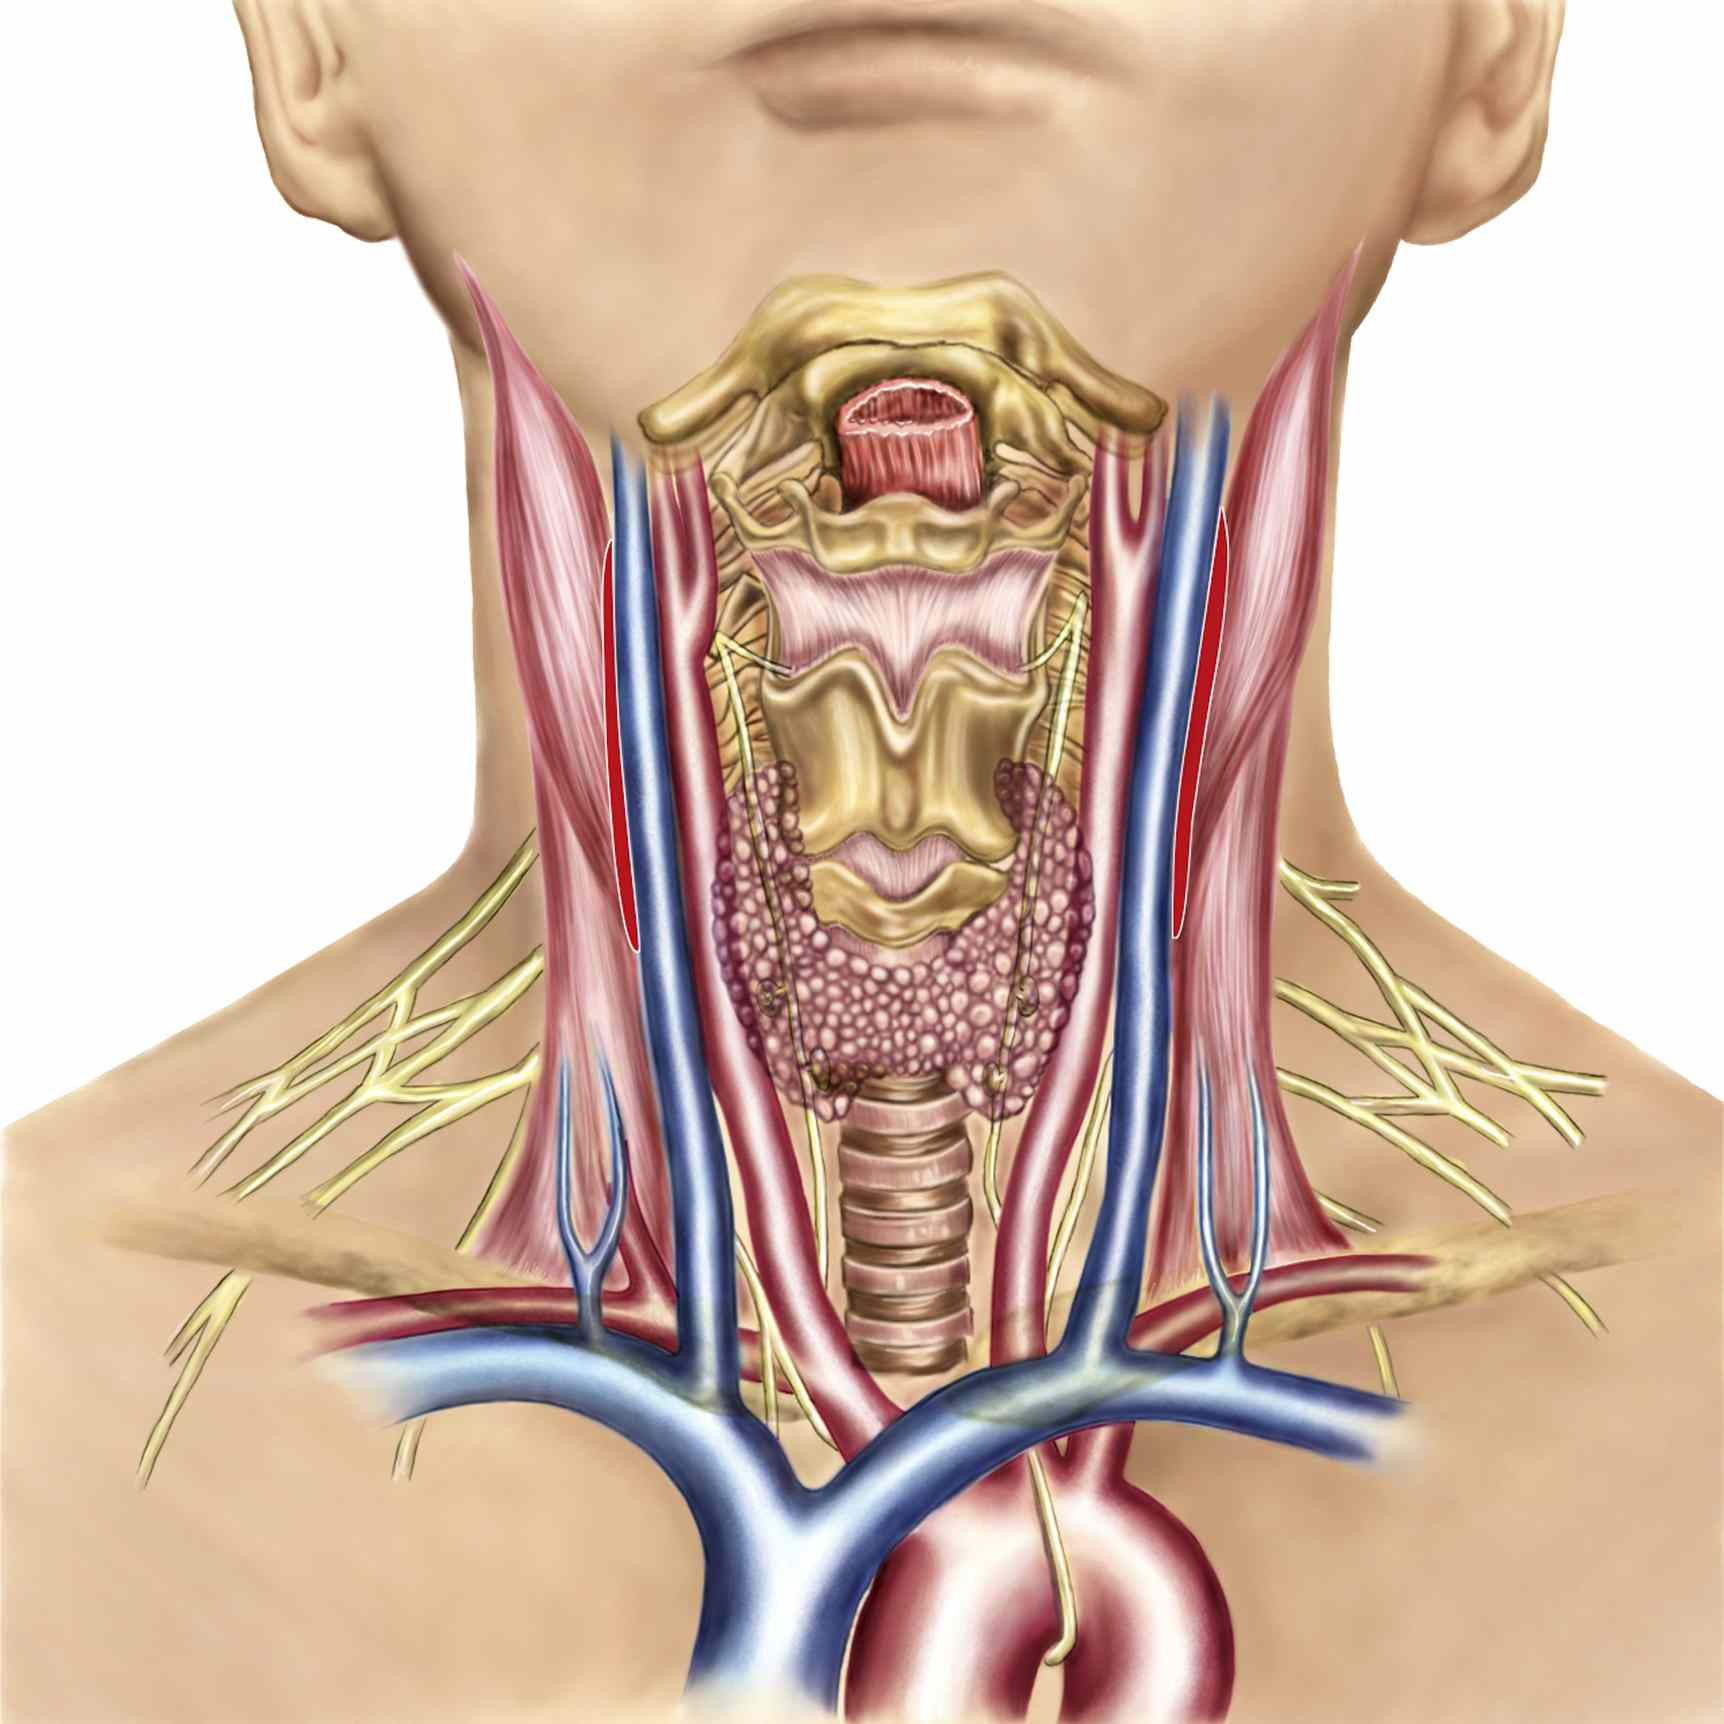 Neck anatomy showing arteries of pharyngeal region and thyroid, parathyroid glands